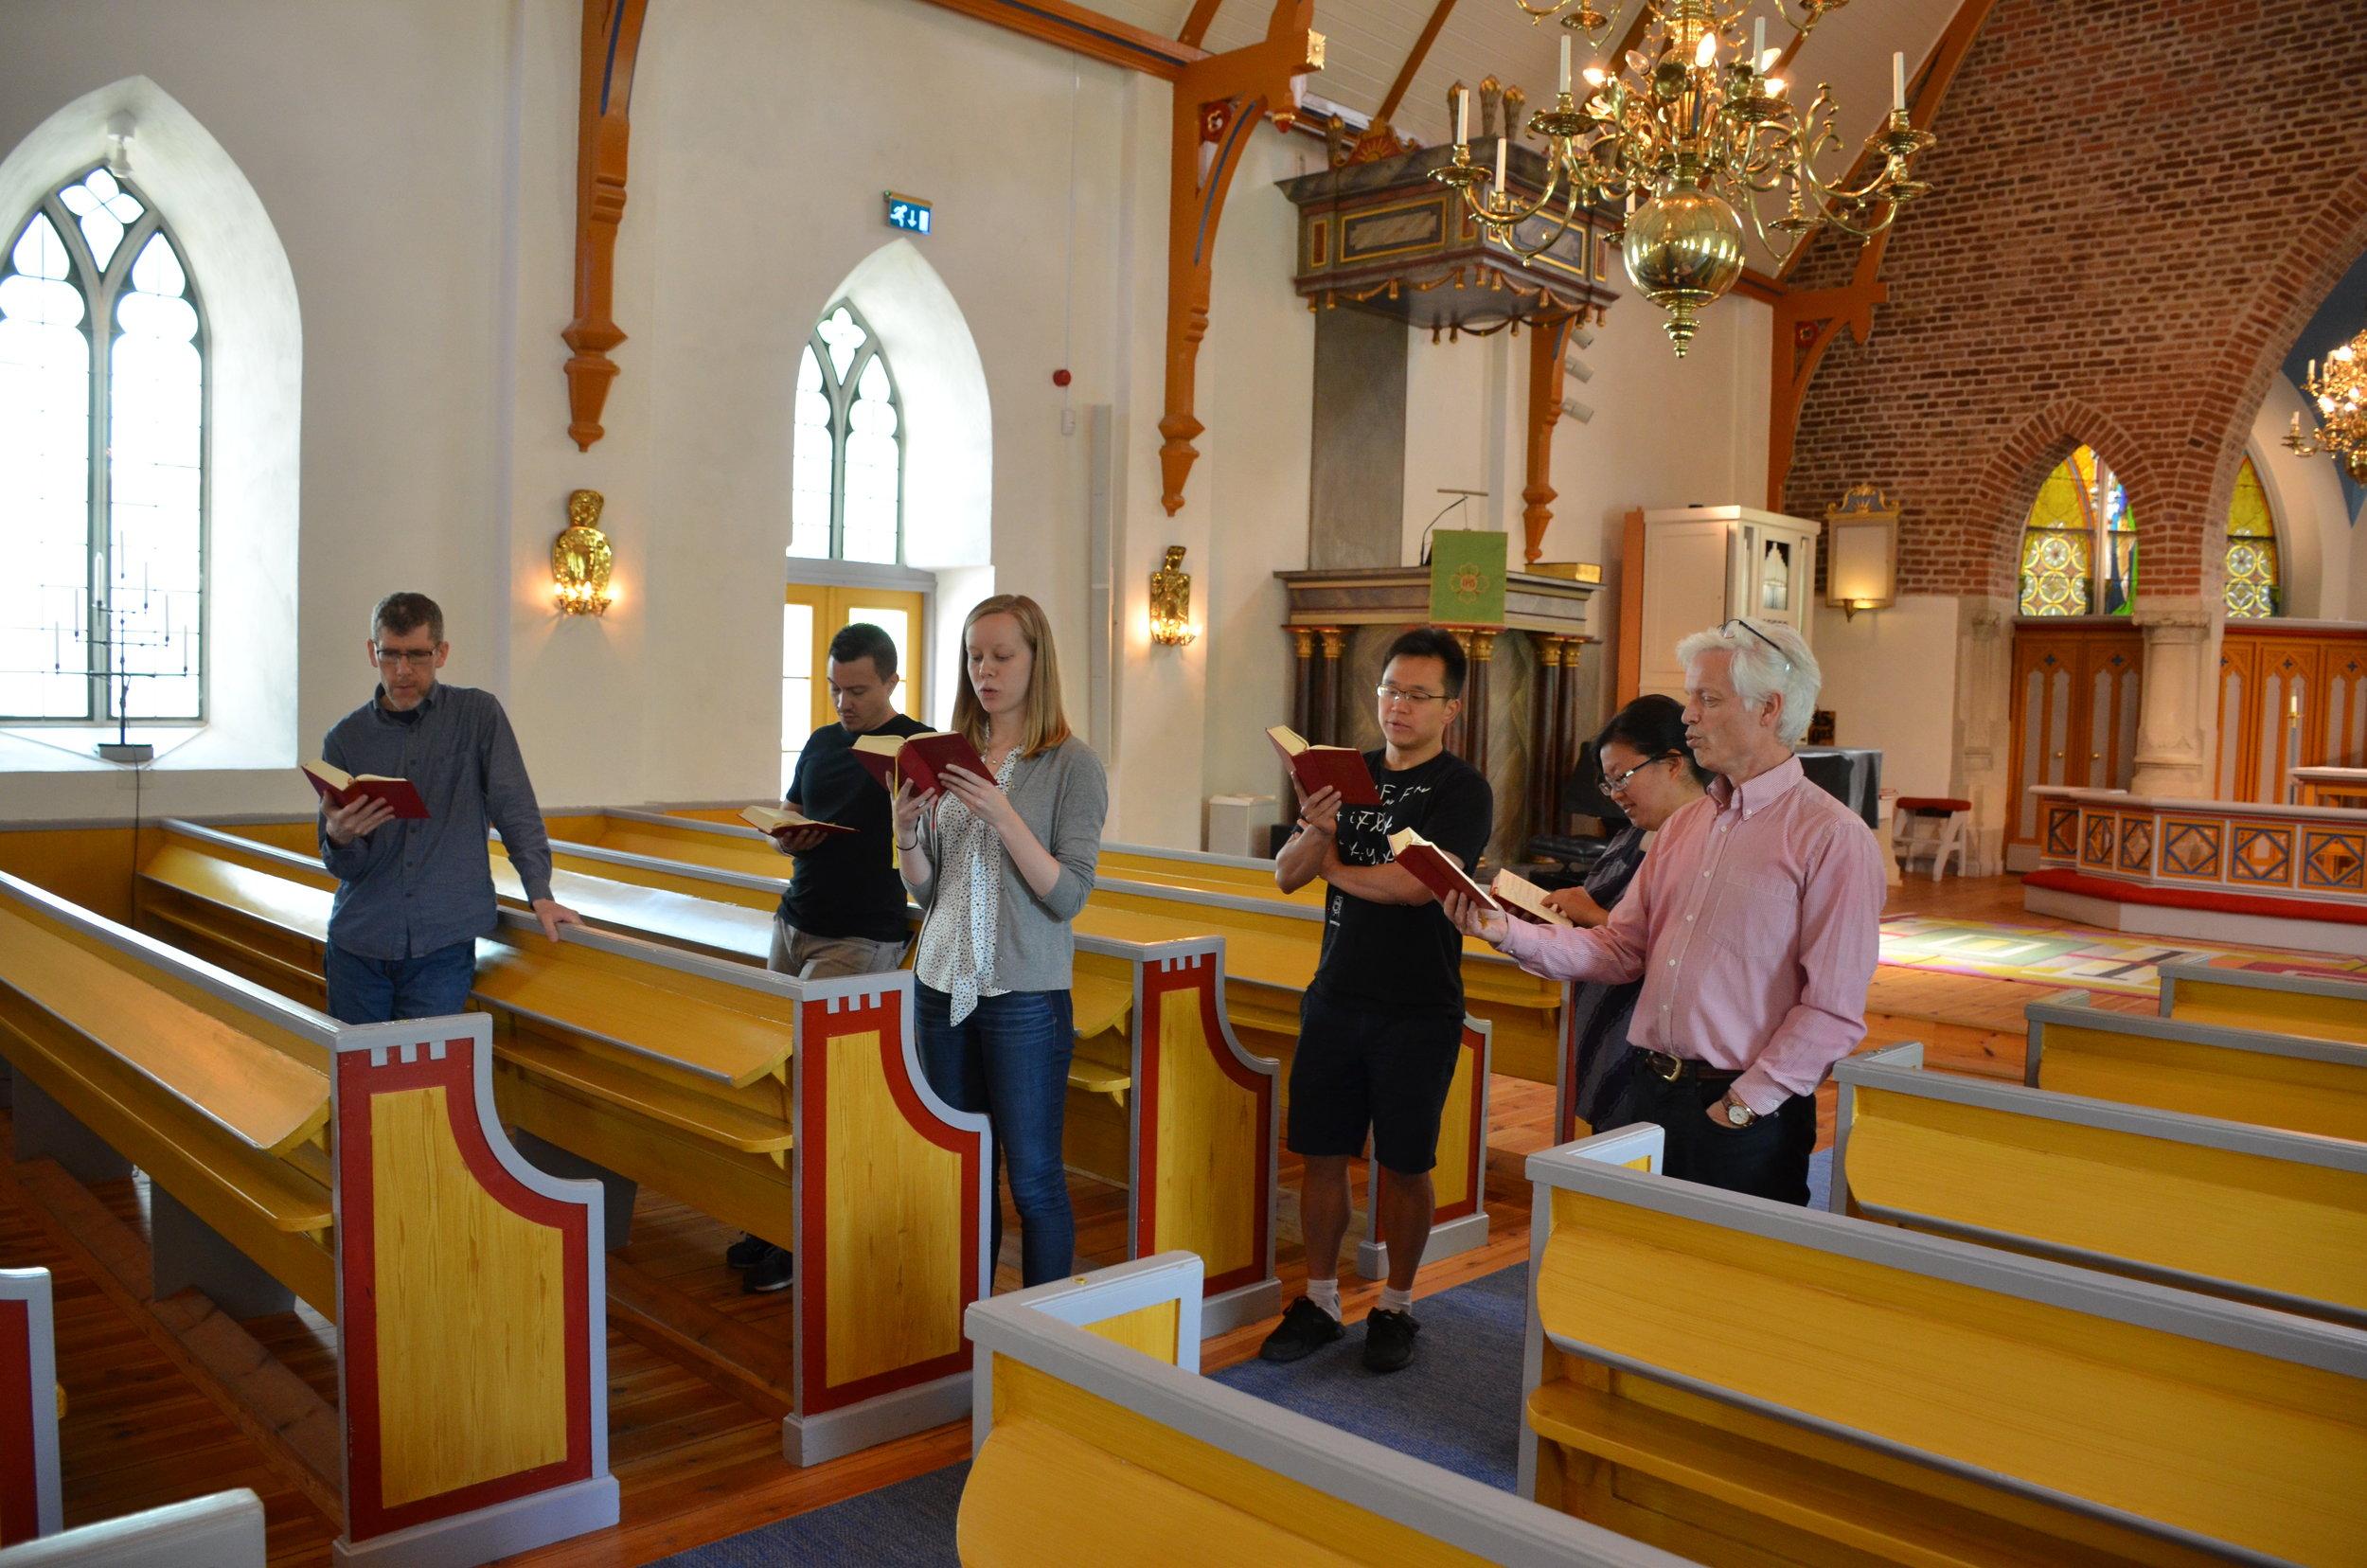 Members of Boston Organ Studio sing a hymn, with the 1783 Schiörlin organ in Jonsered, Sweden.